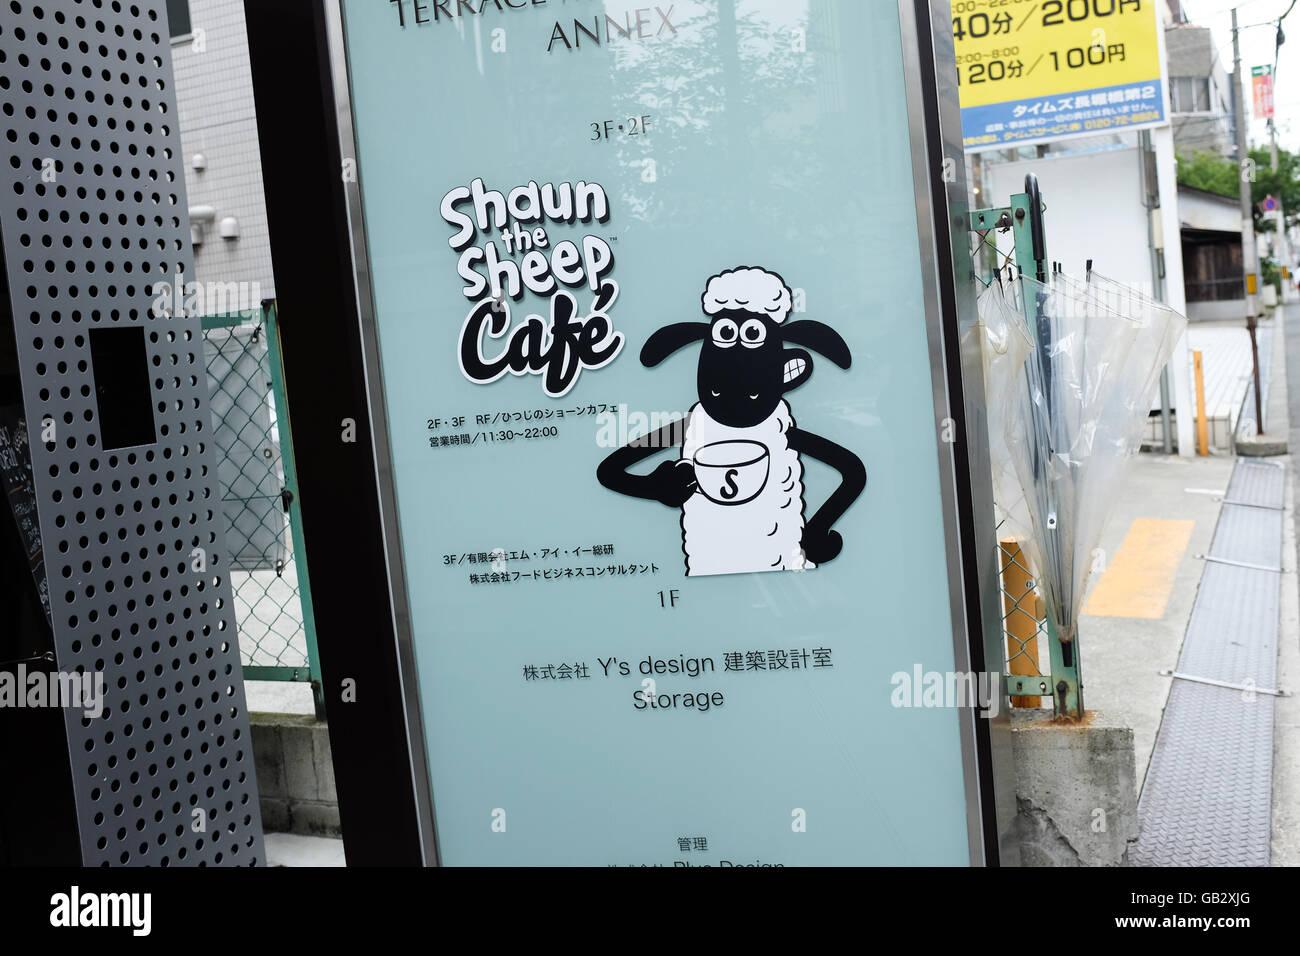 A 'Shaun the Sheep' themed cafe in Osaka, Japan. - Stock Image